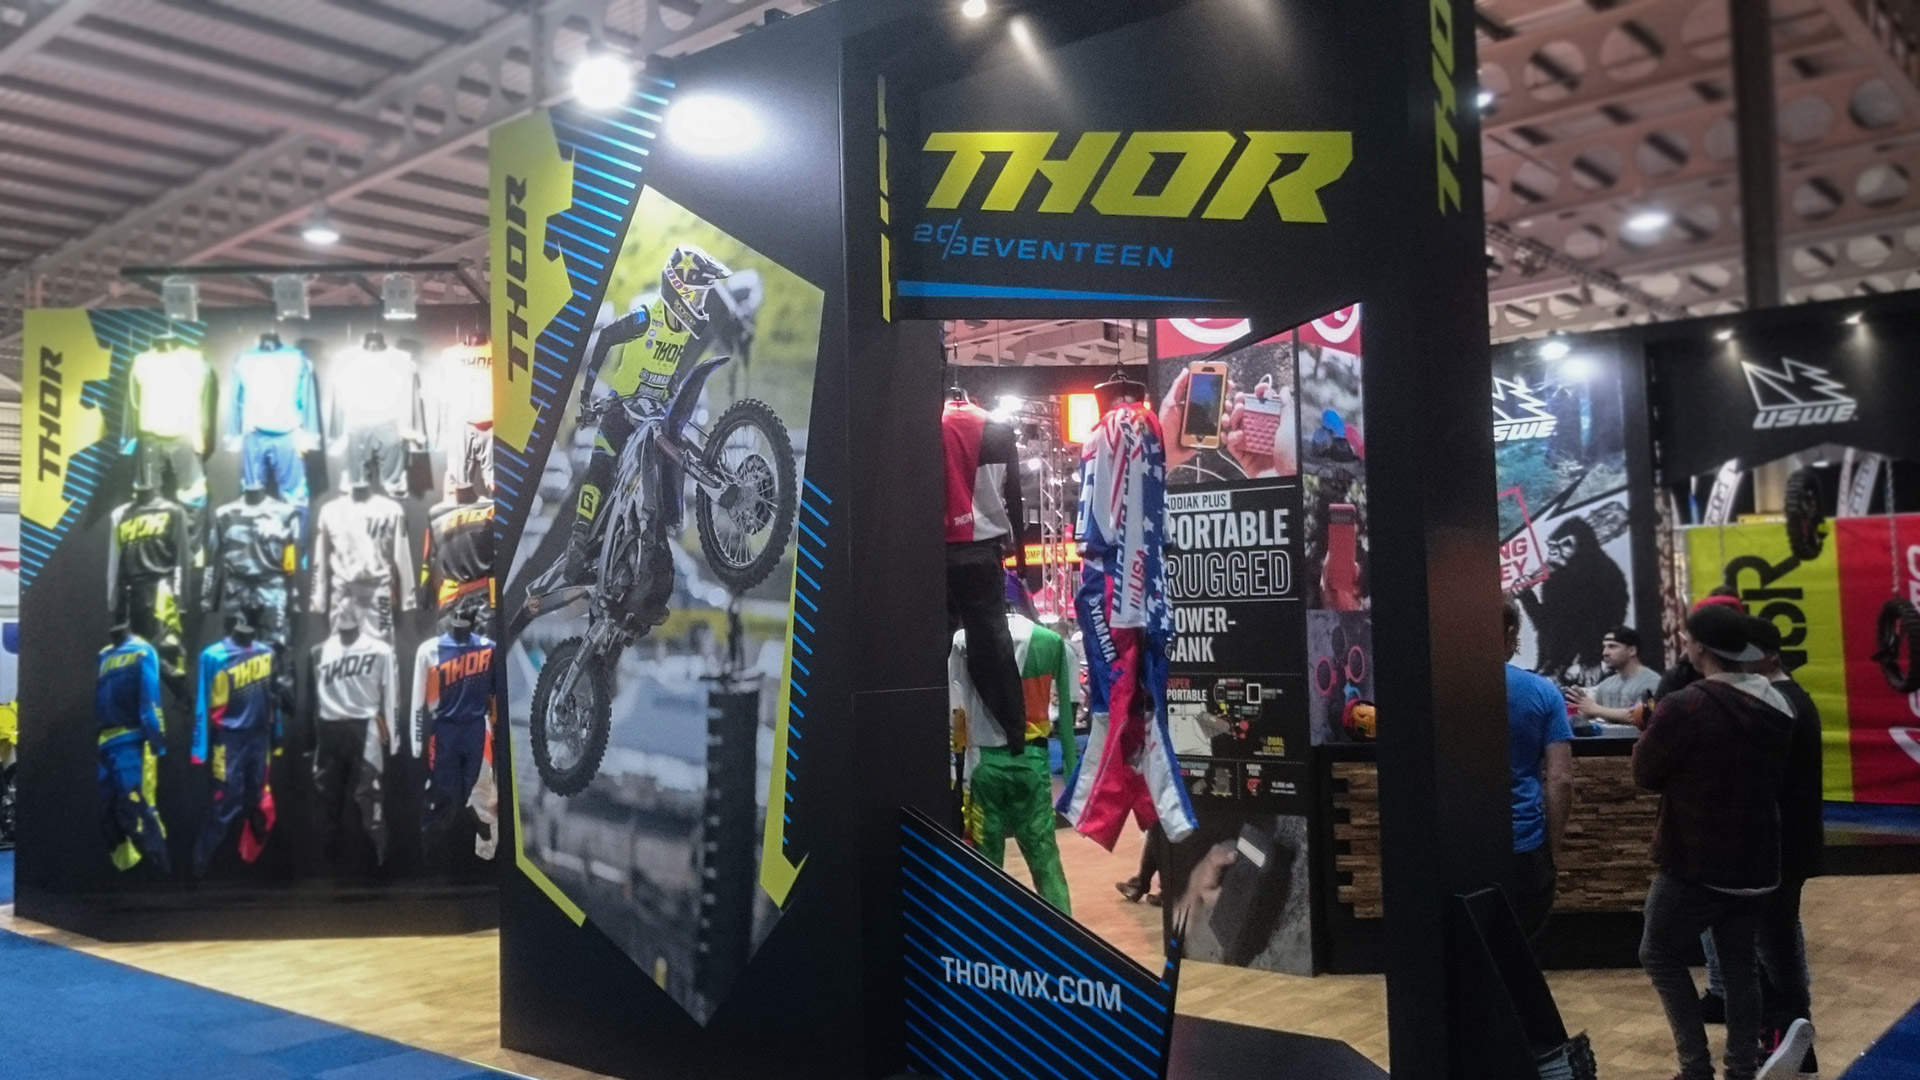 Dirt Bike Show UK - Thor Stand